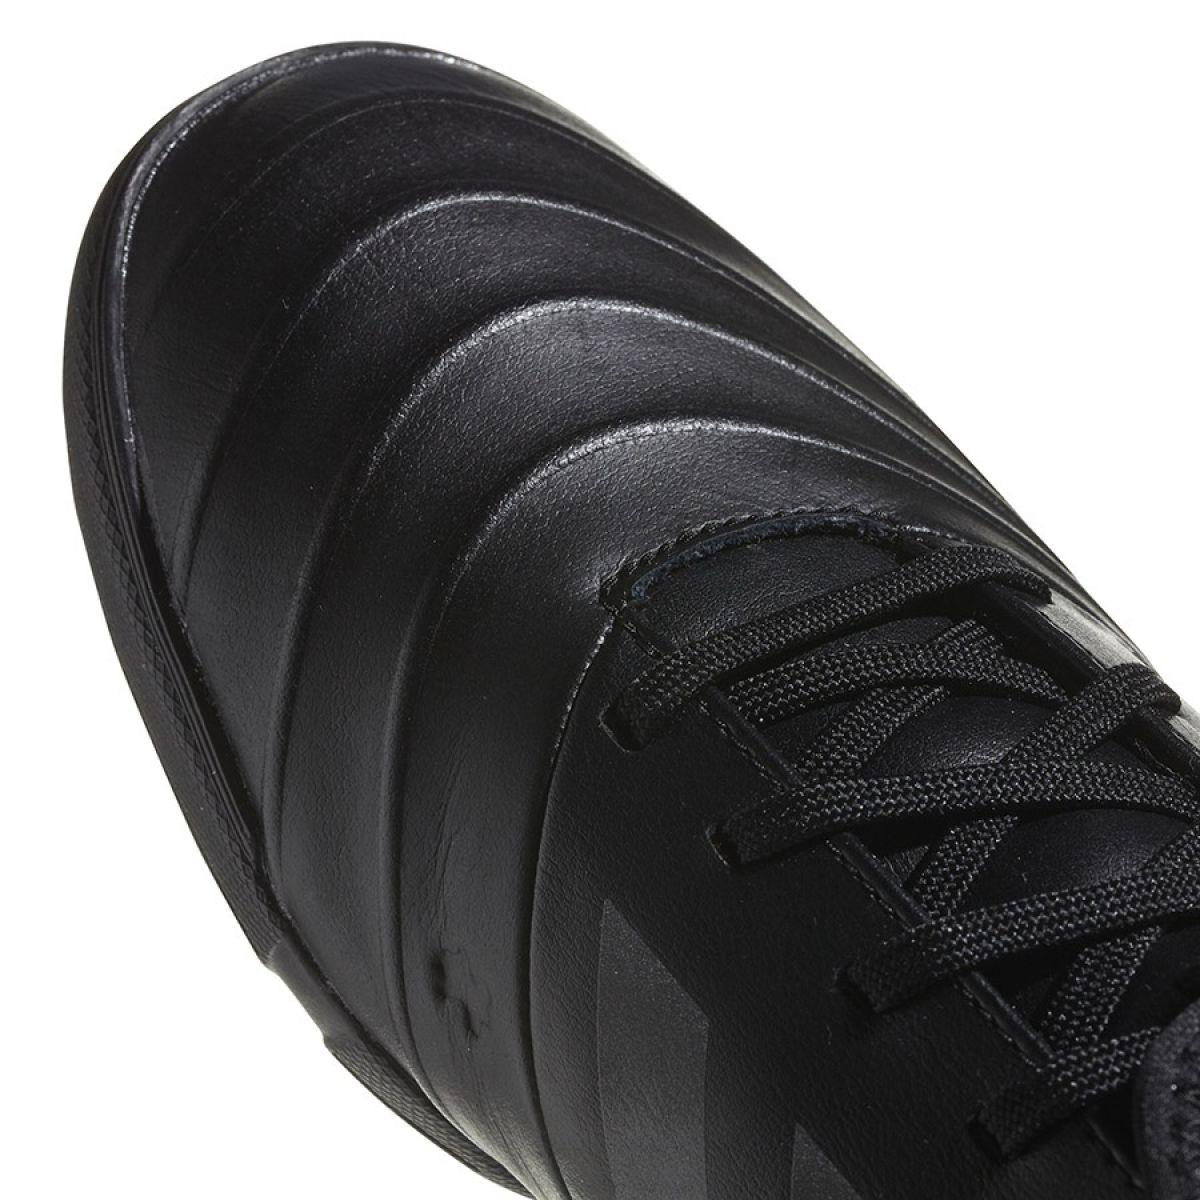 brand new 325b7 092d7 Buty piłkarskie adidas Copa Tango 18 CP9023 40 (7366677825)